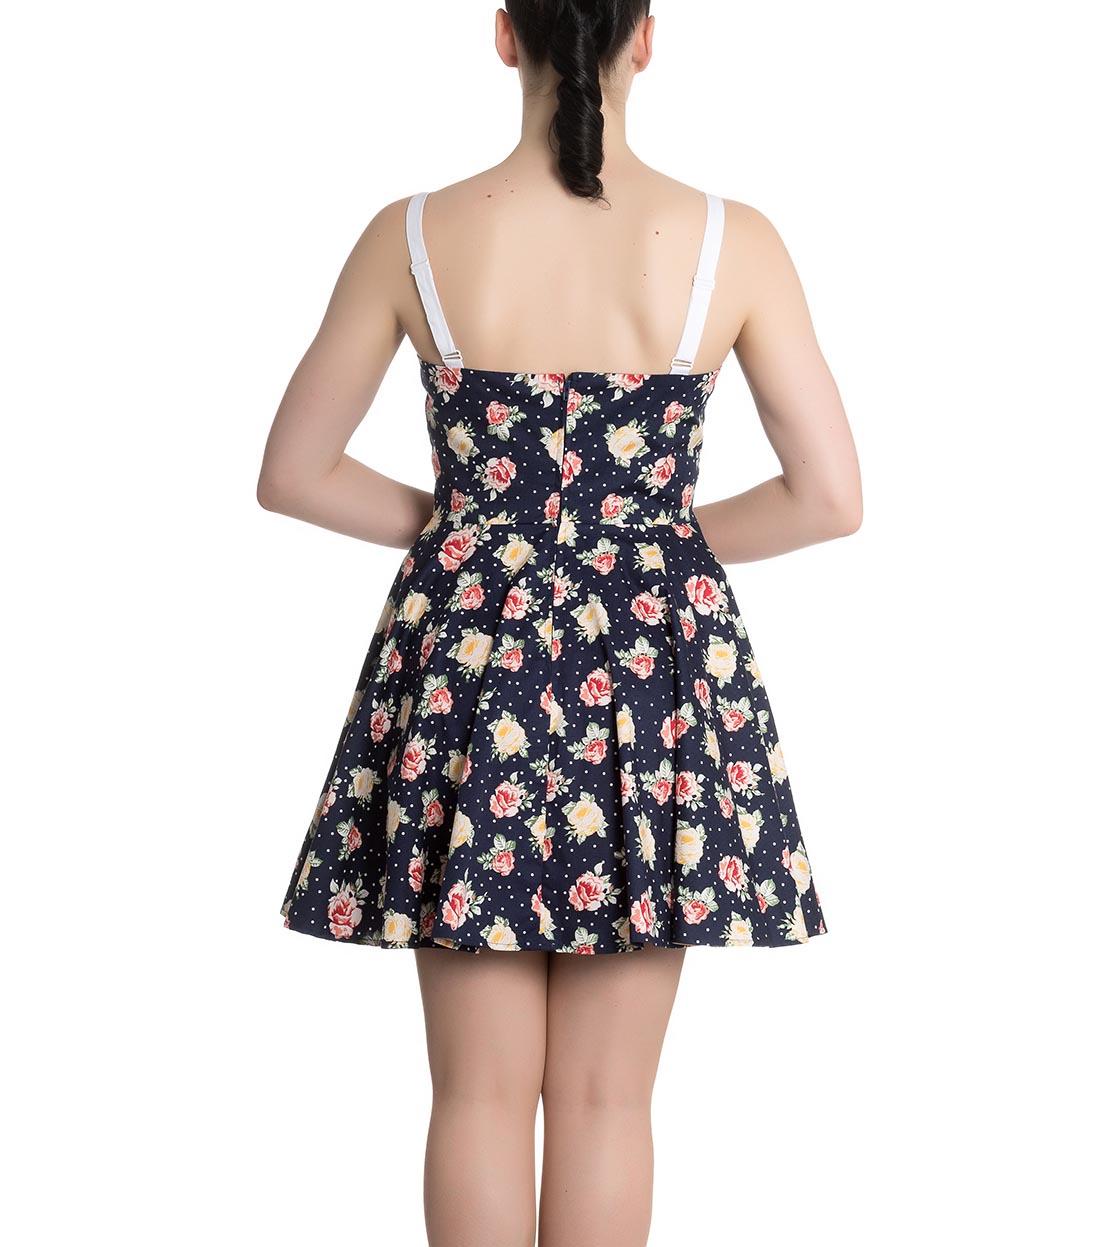 Hell-Bunny-Navy-Blue-Floral-Roses-Flowers-Mini-Dress-EMMA-Polka-Dot-All-Sizes thumbnail 13